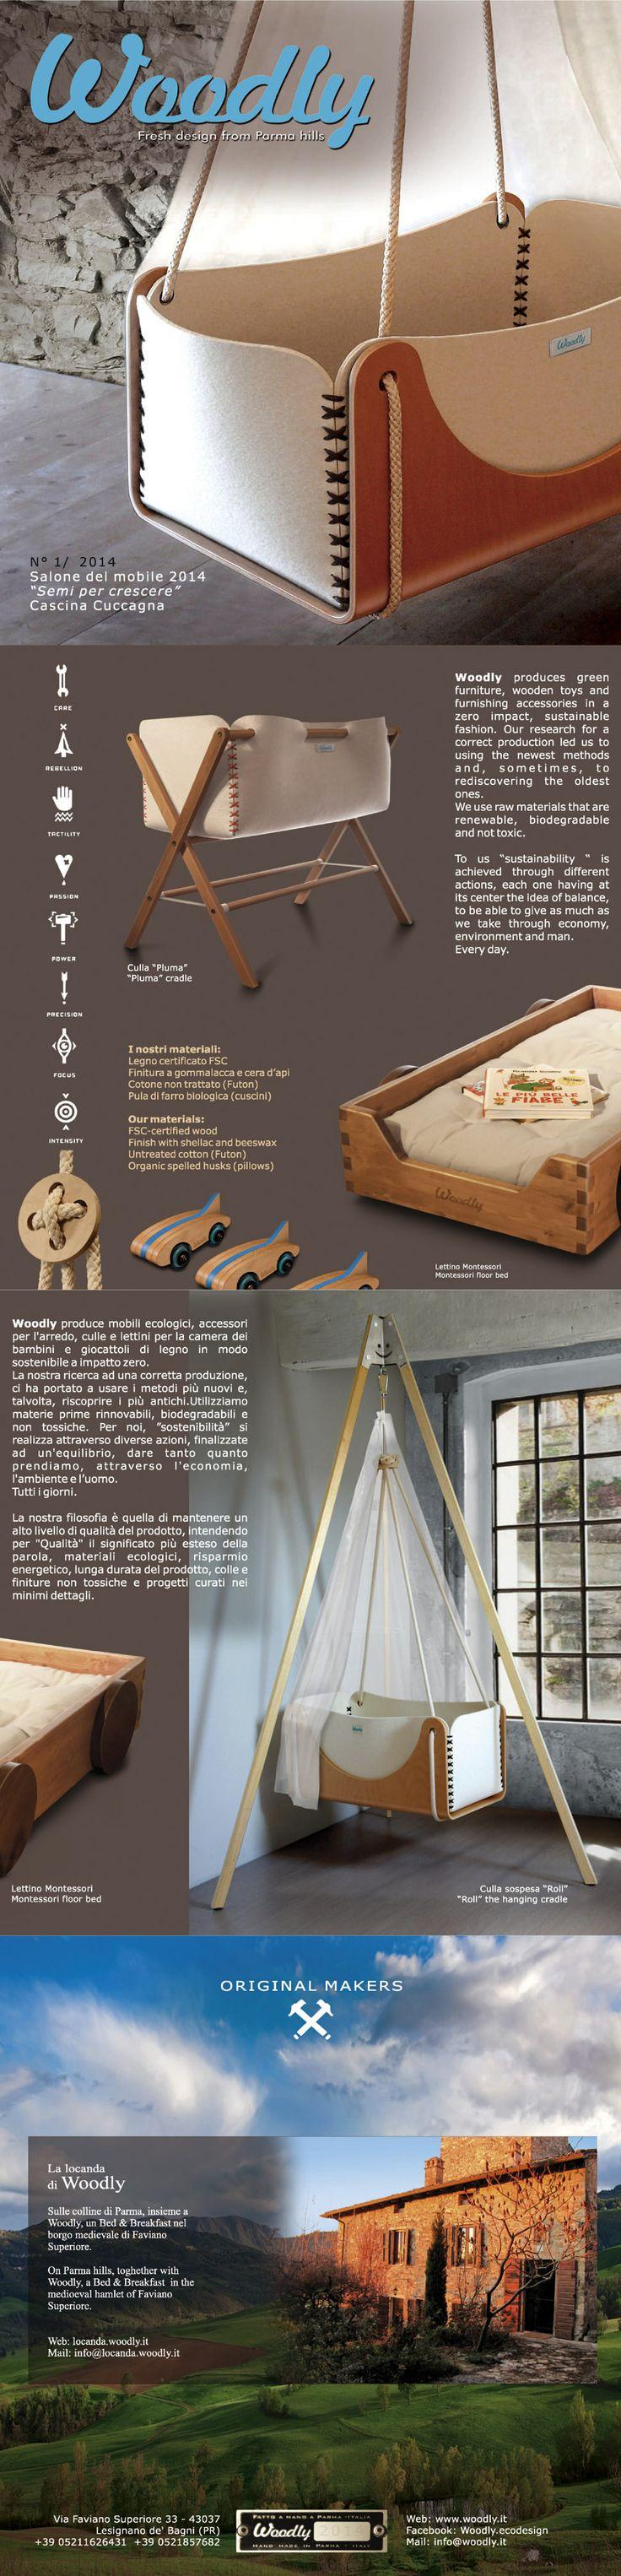 Woodly #design #kids #montessori